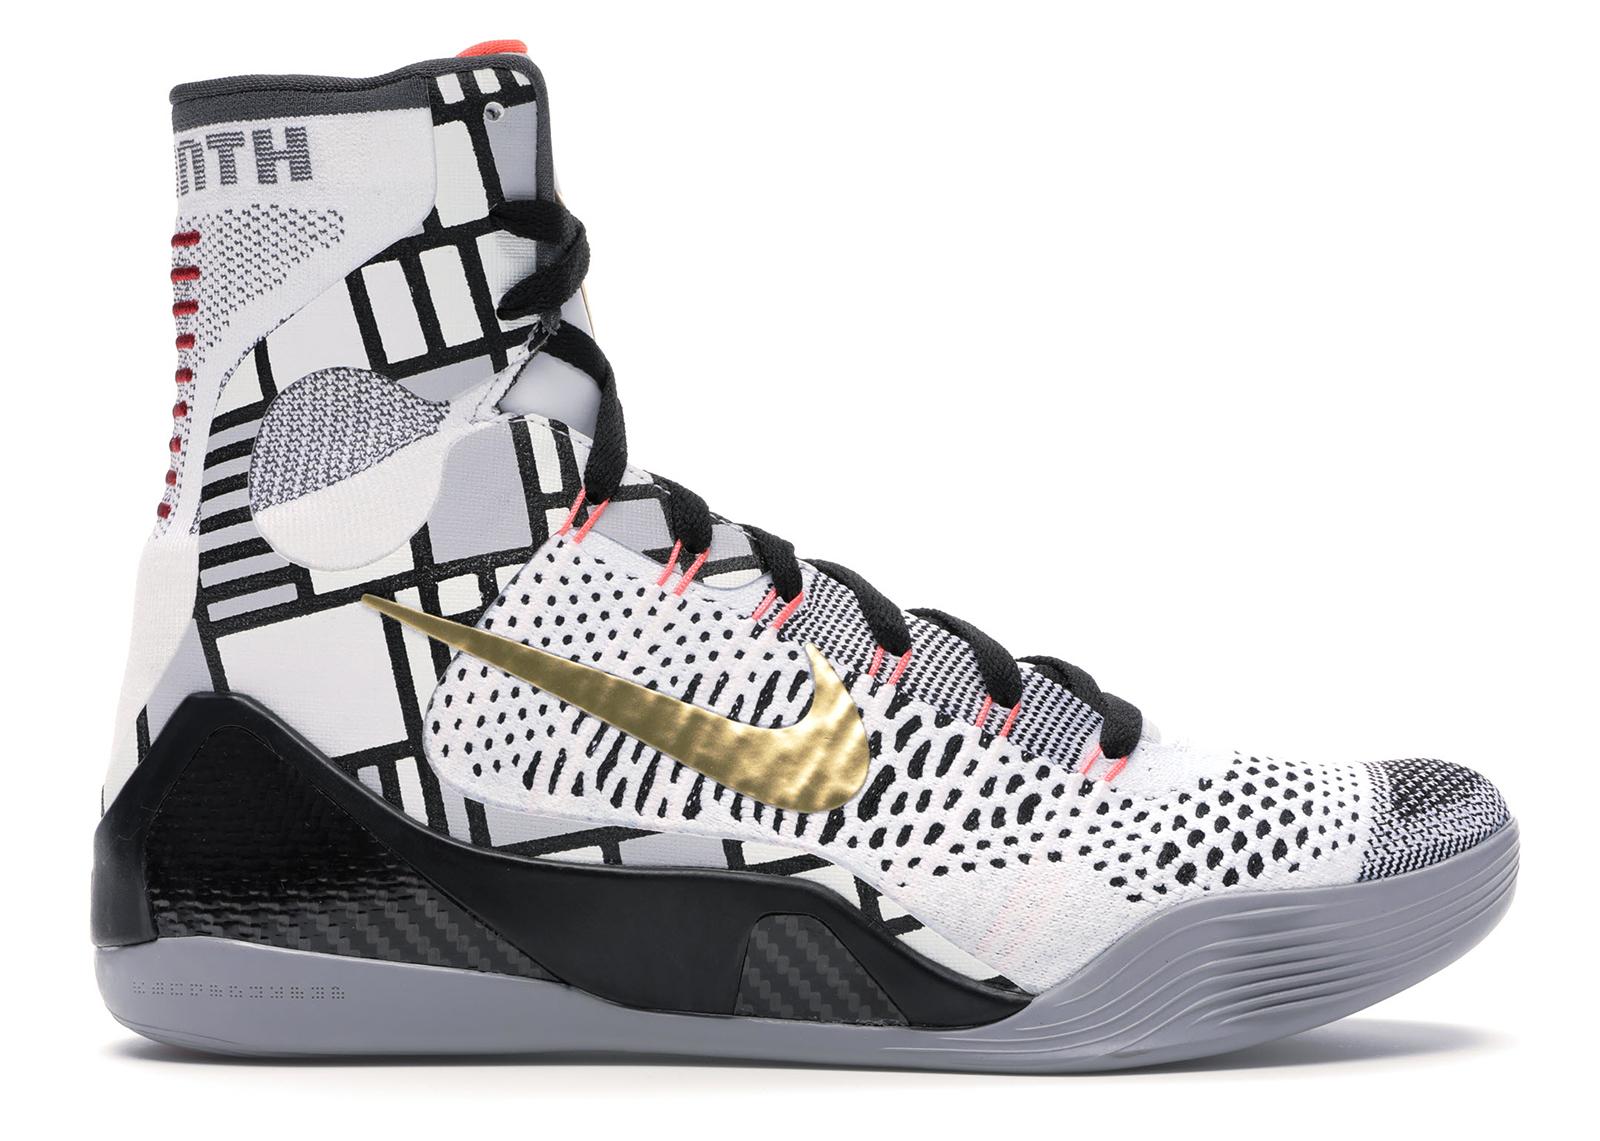 Nike Kobe 9 Elite Gold Fundamentals